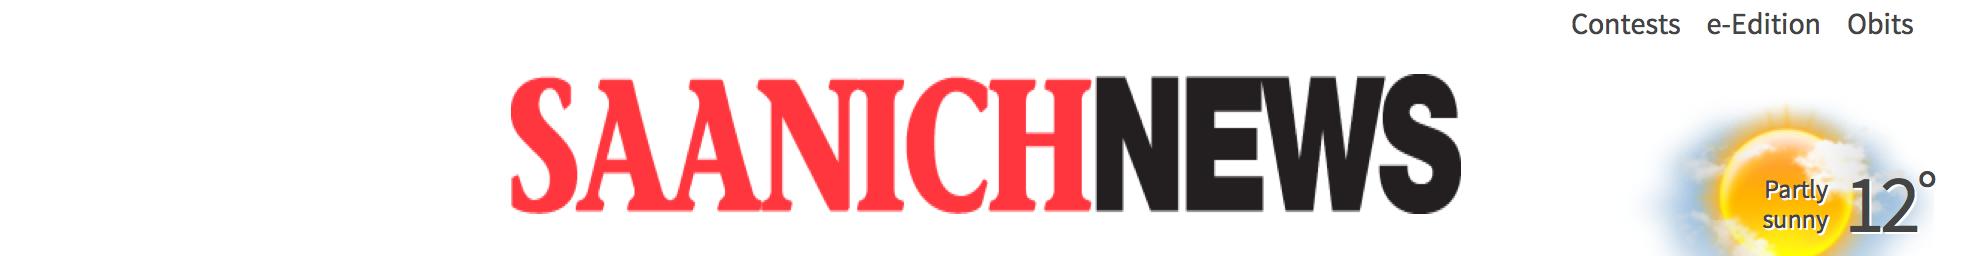 saanich news